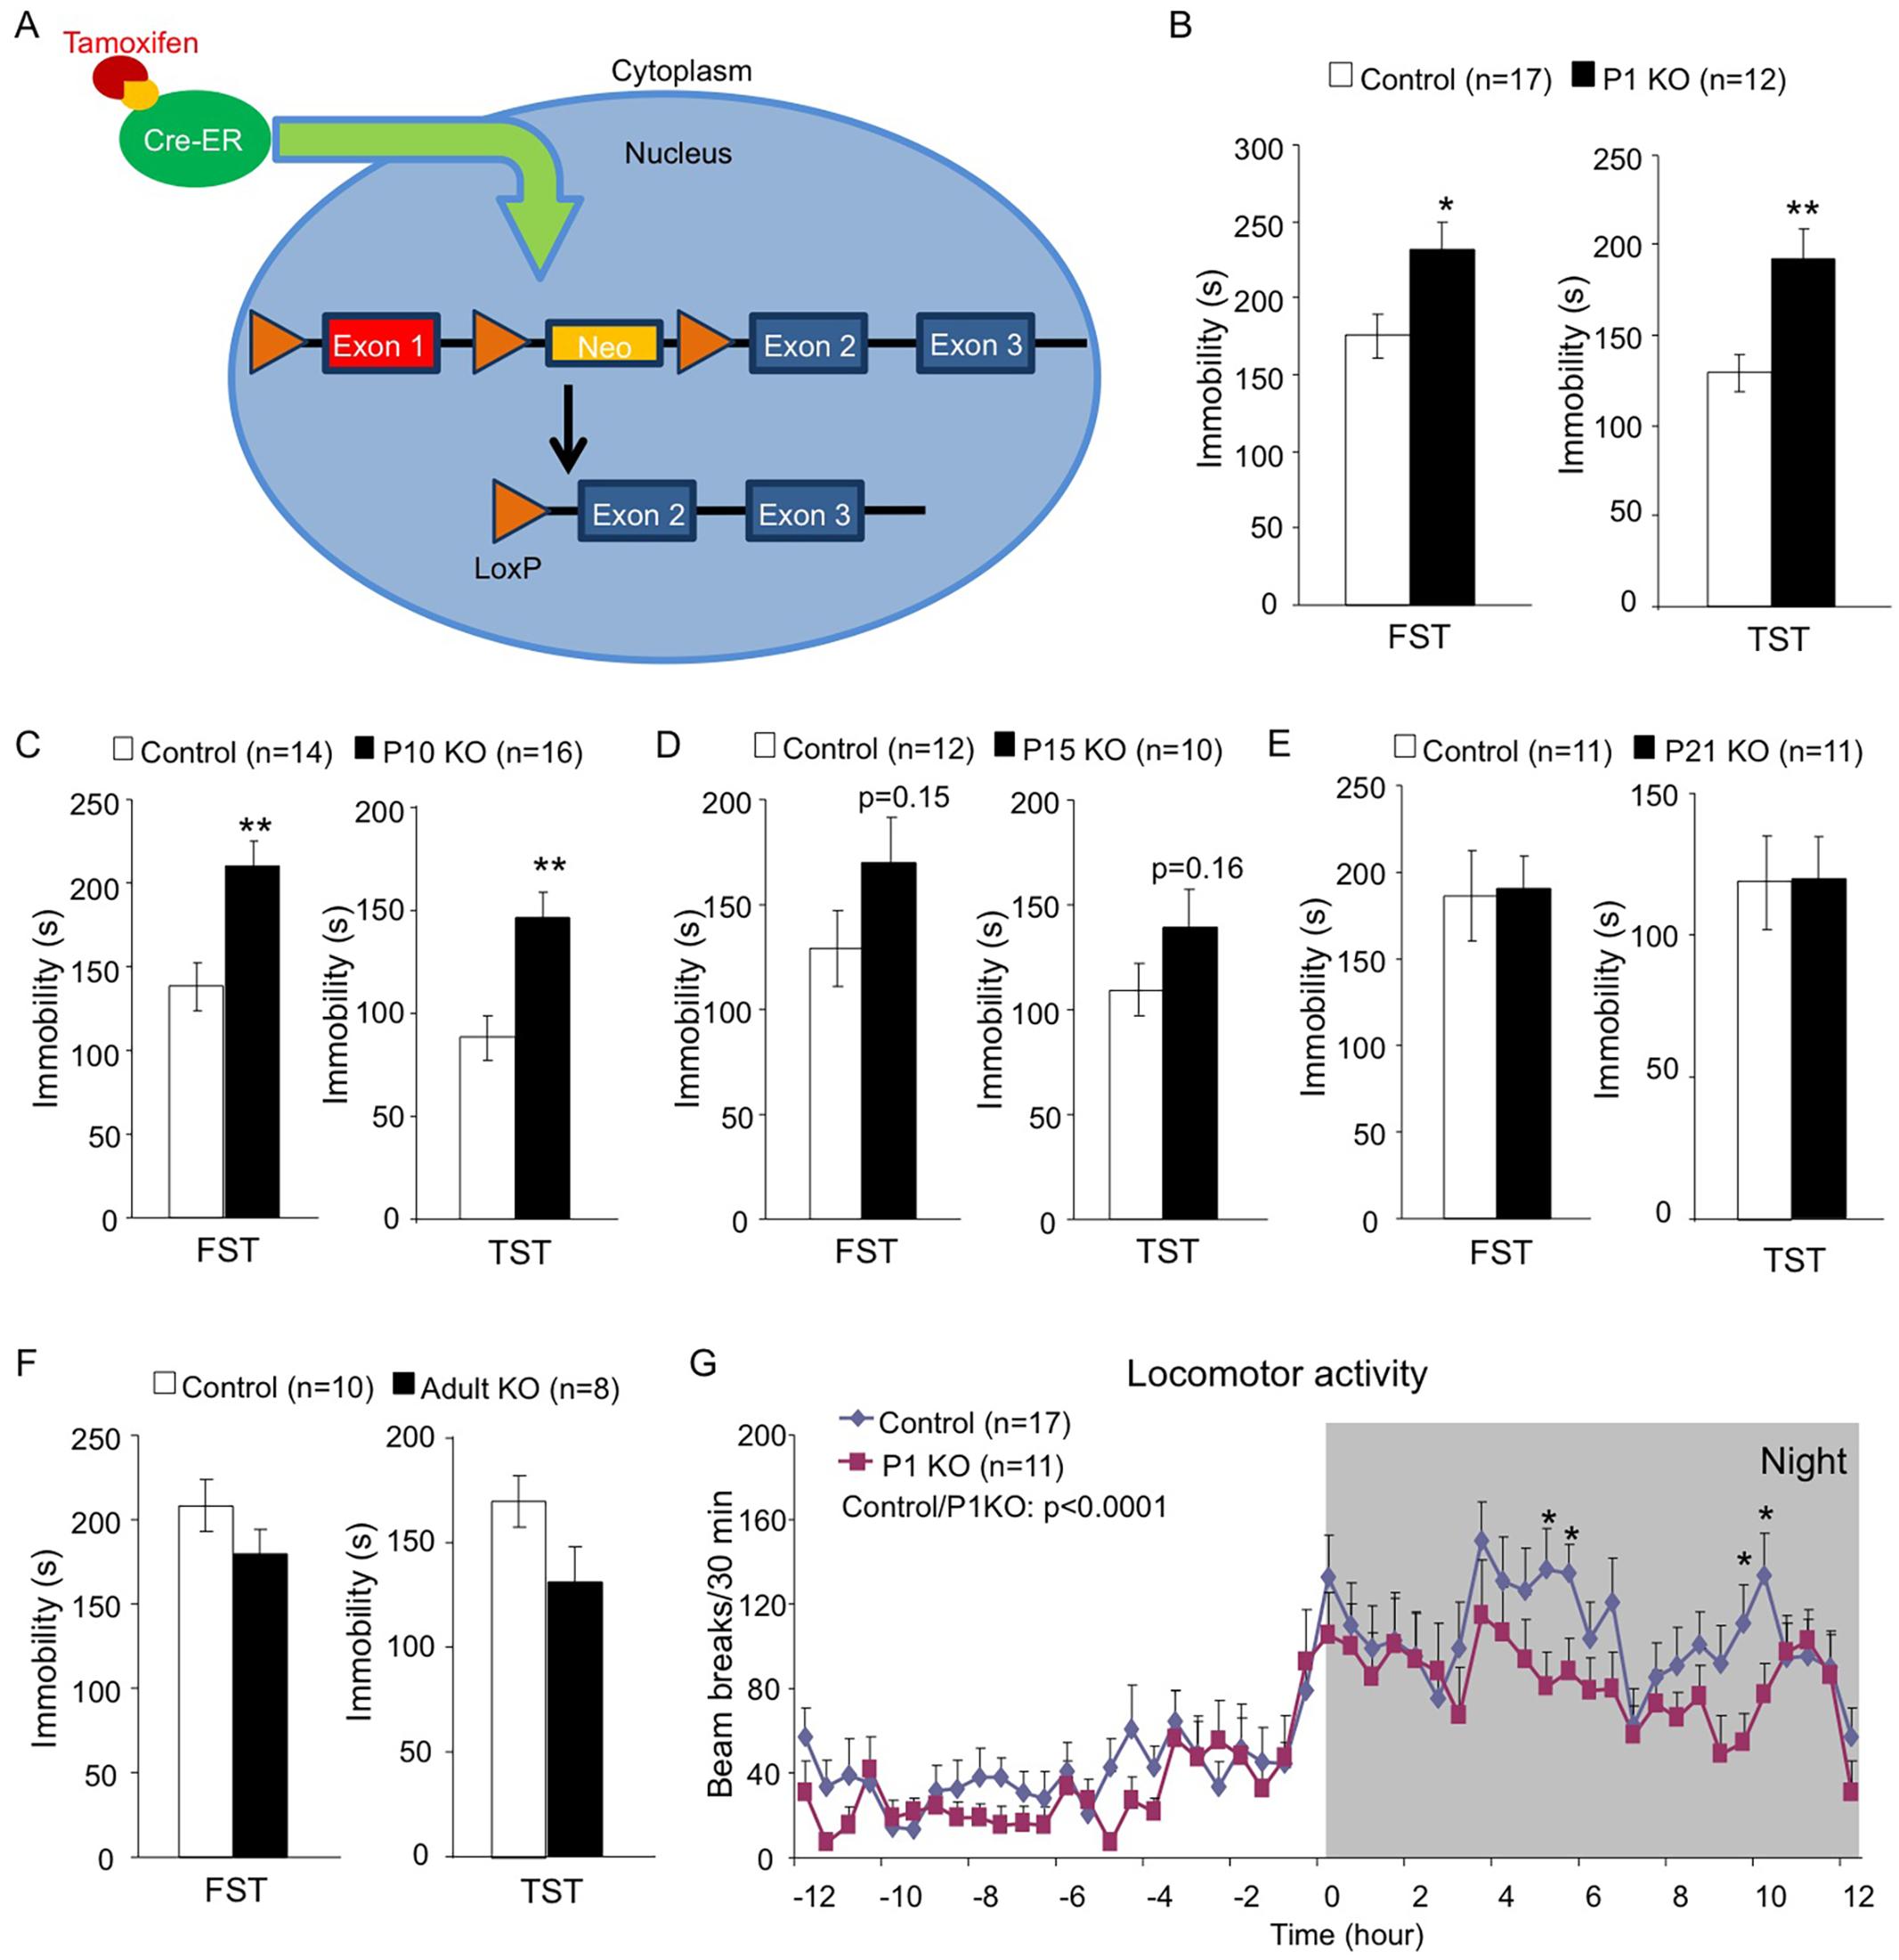 Early postnatal depletion of Hap1 leads to depressive-like behavior in adult mice.